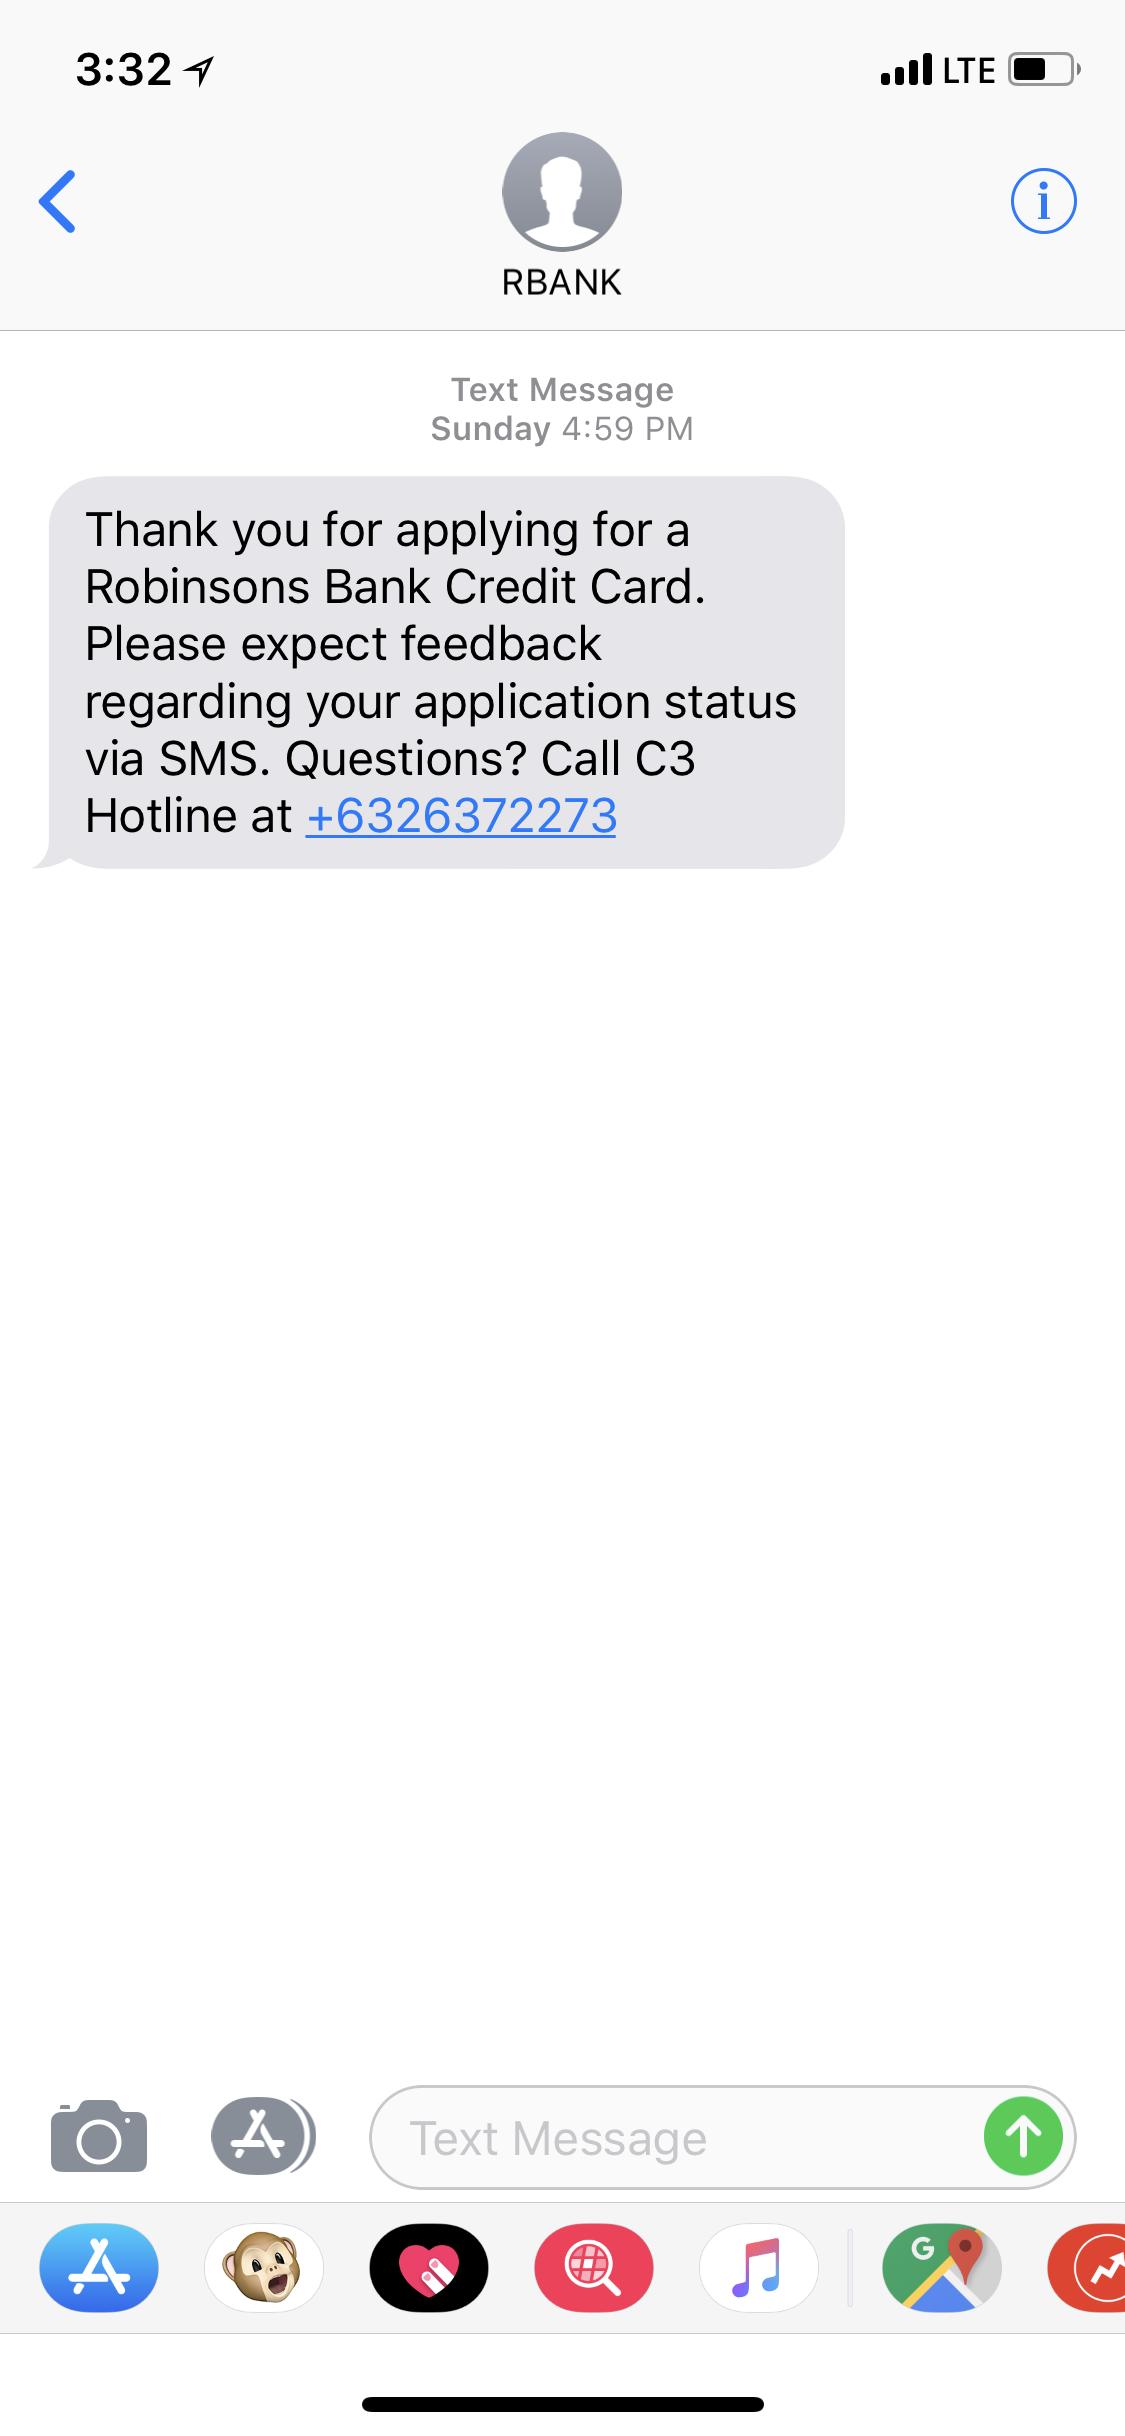 rcbc credit card application follow up